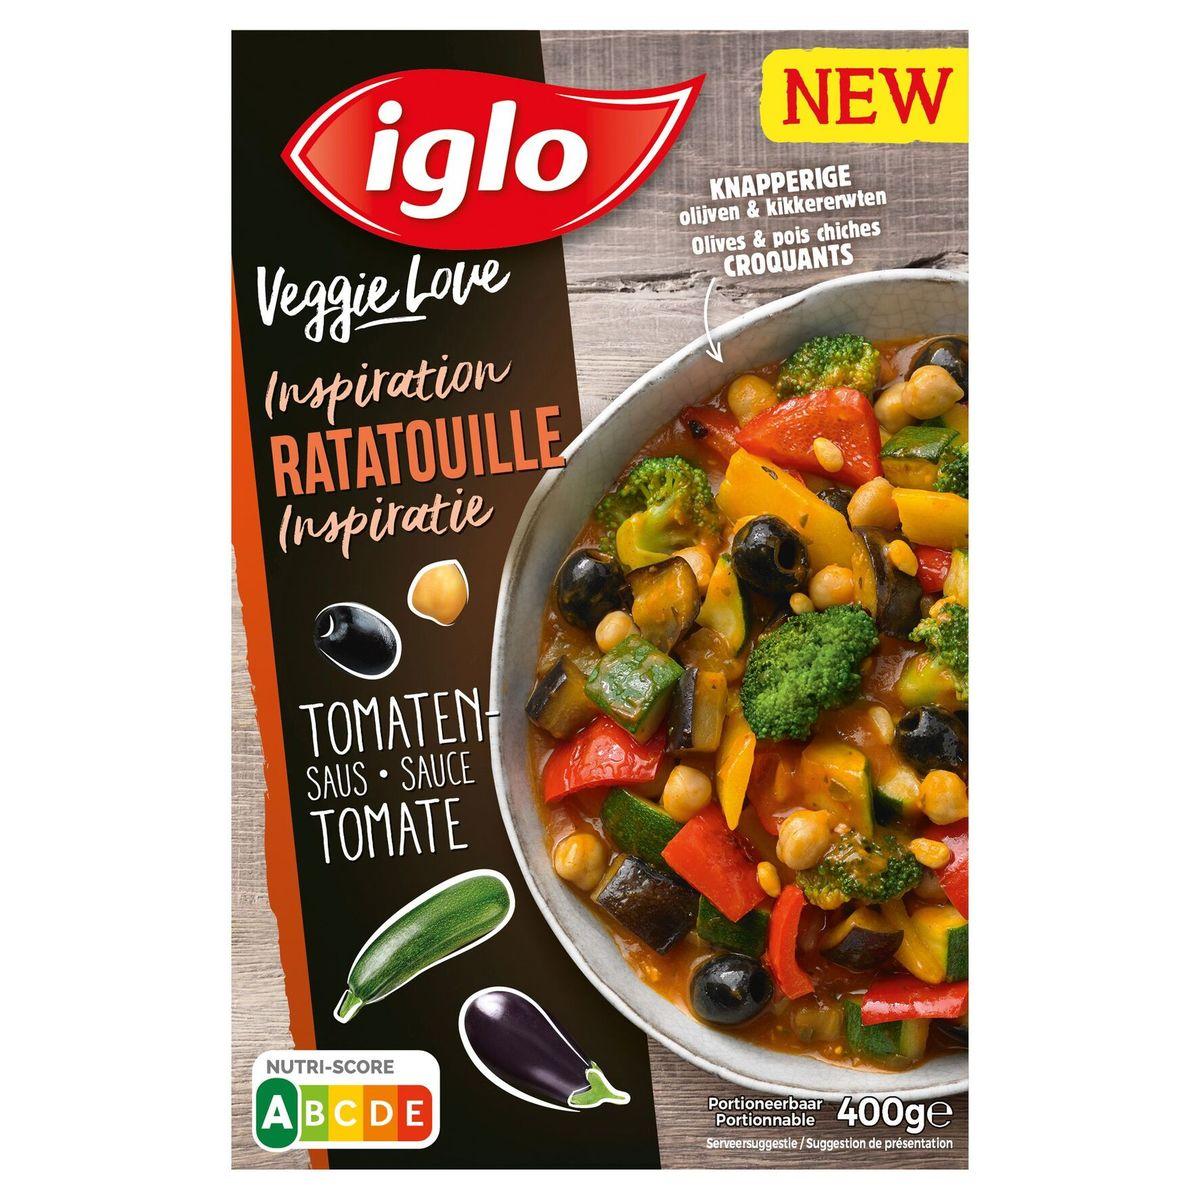 Iglo Veggie love Inspiratie Ratatouille, tomatensaus & olijven 400g